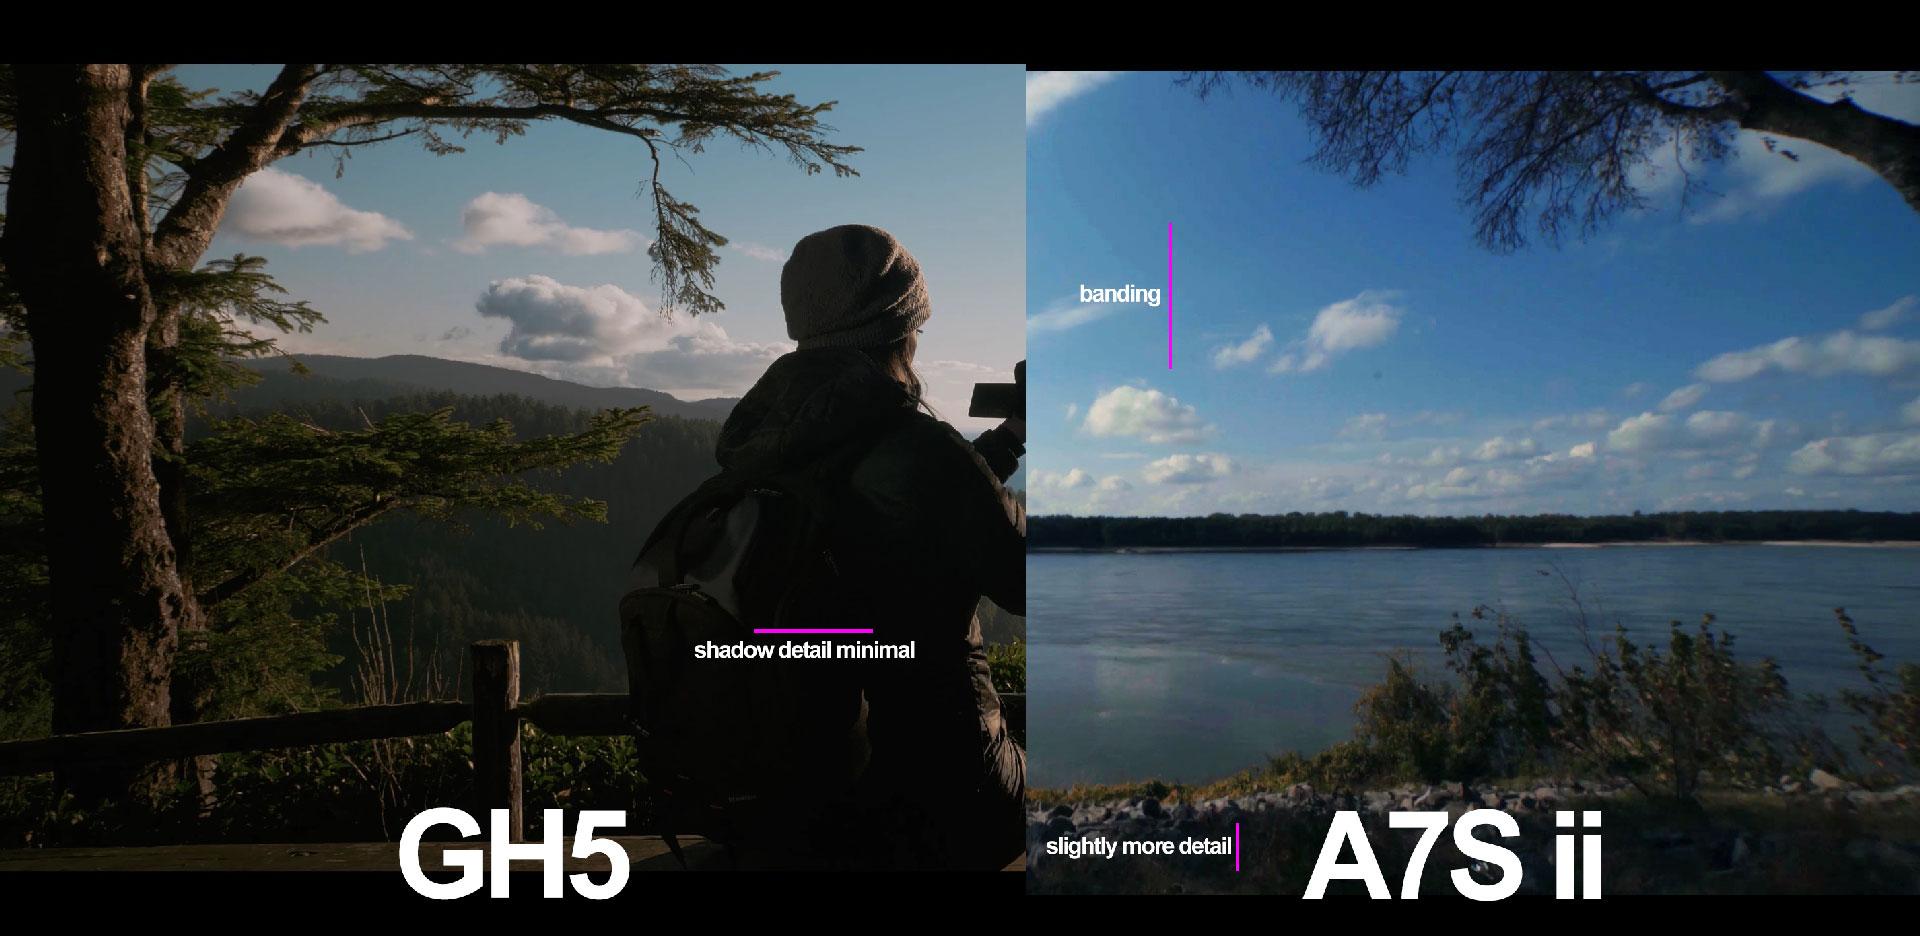 gh5-a7s ii-dynamic range-color-log